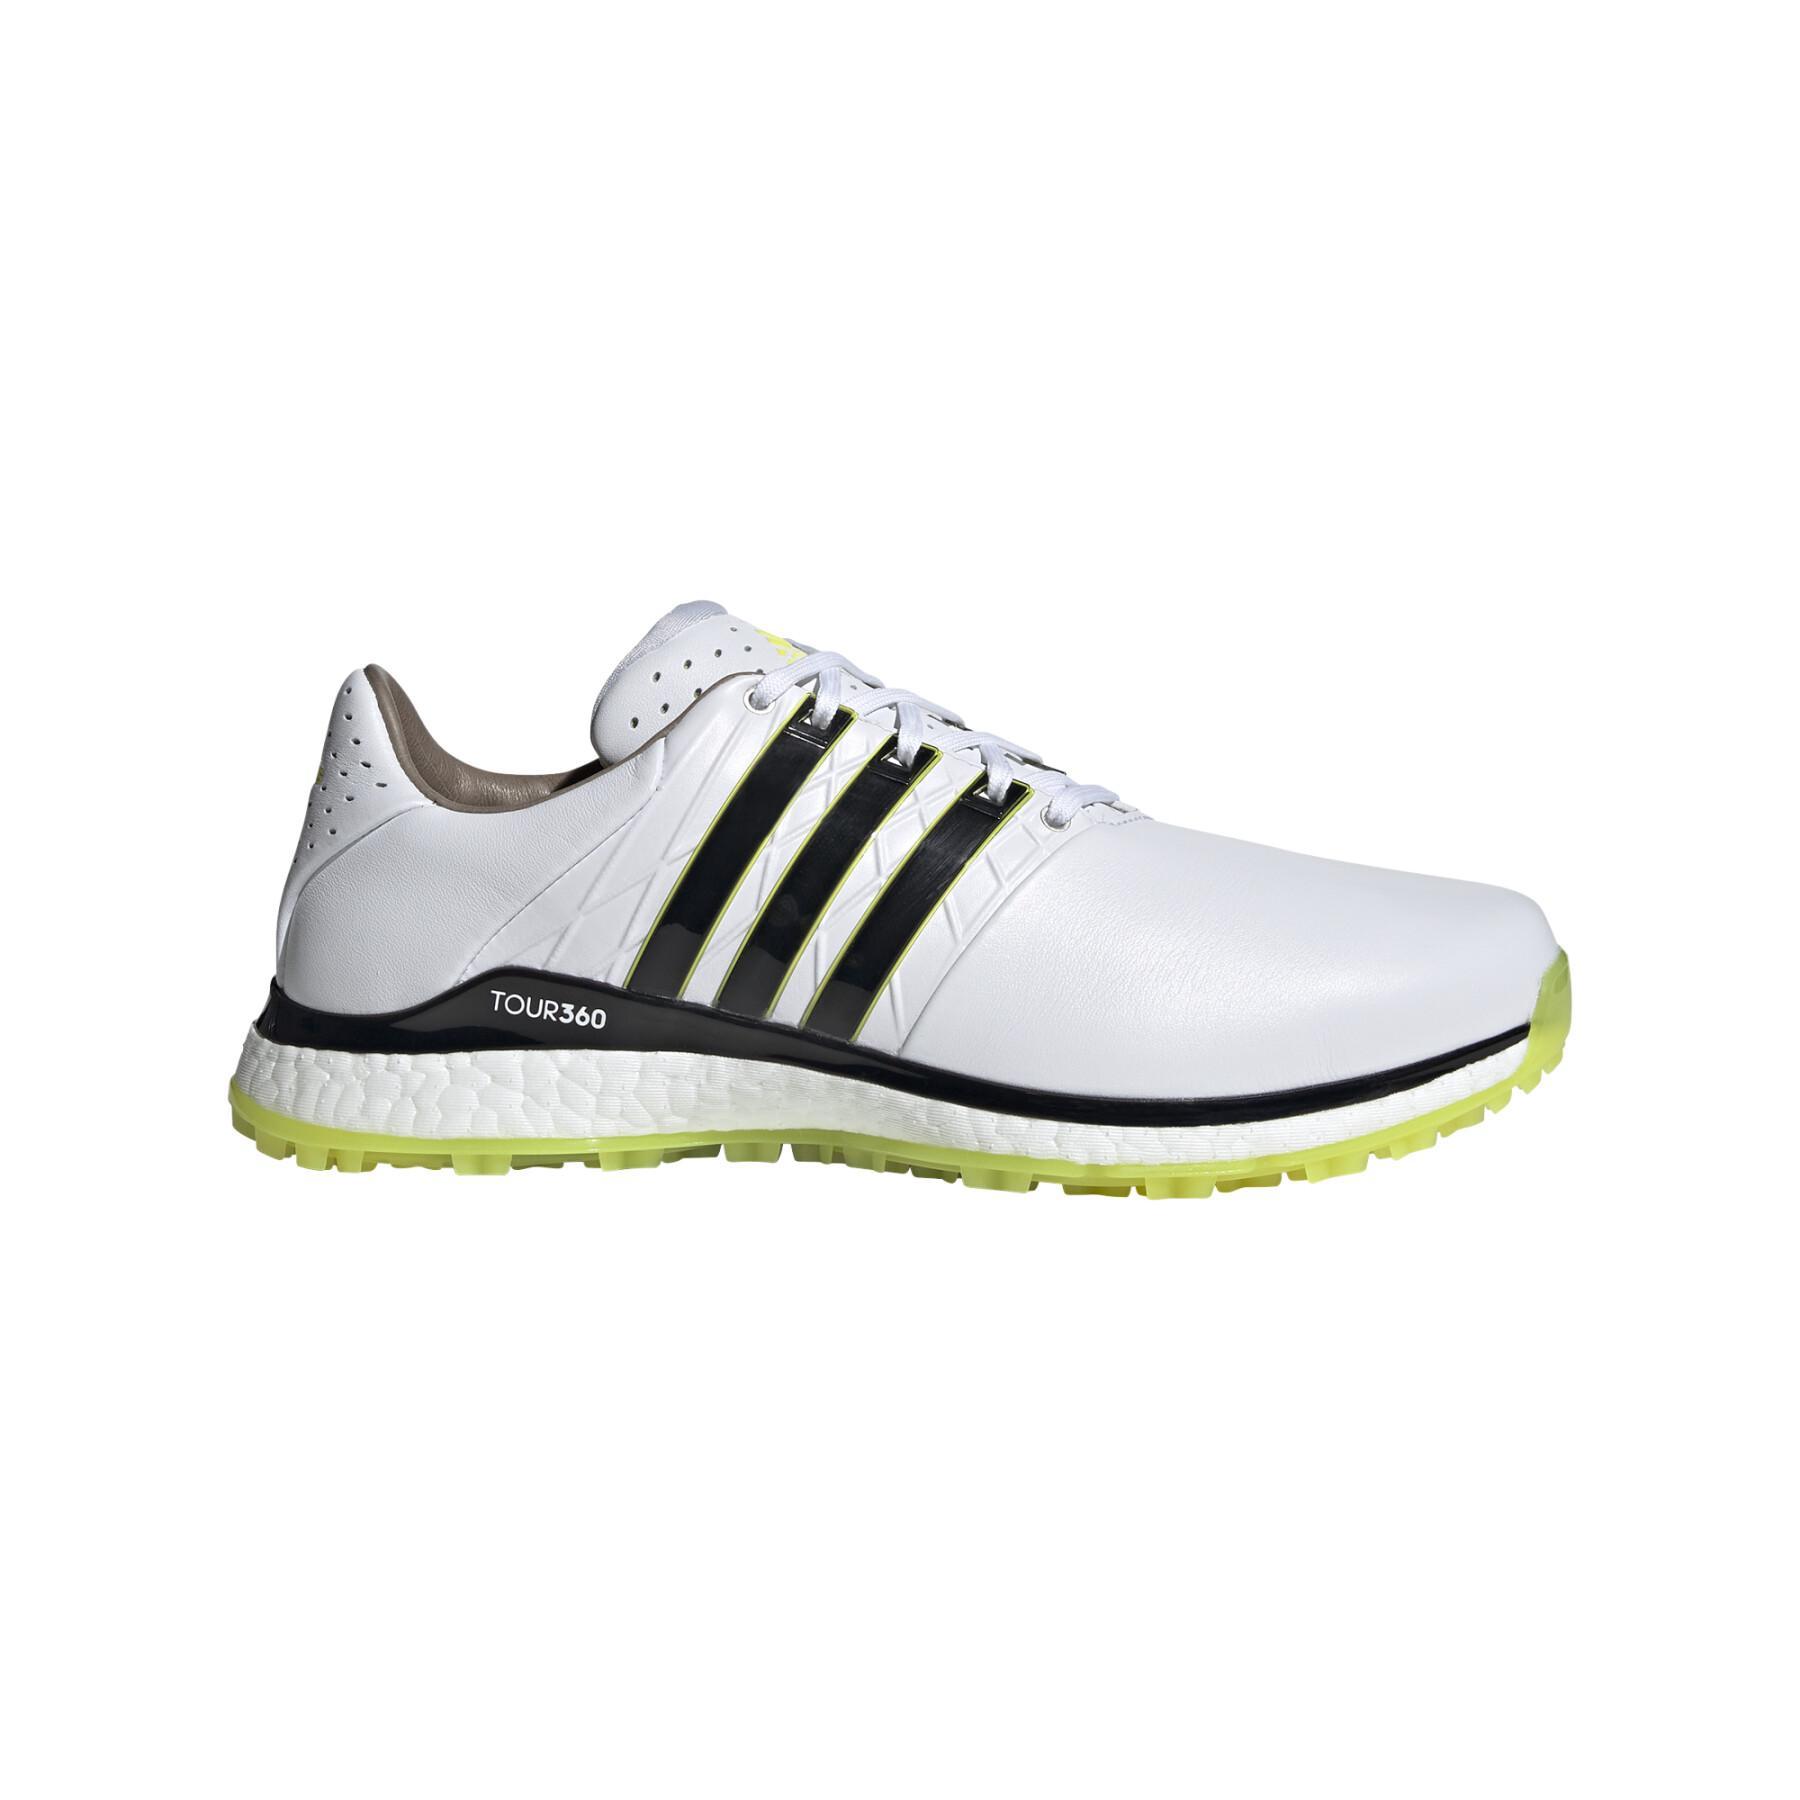 Chaussures adidas TOUR360 XT-SL 2.0